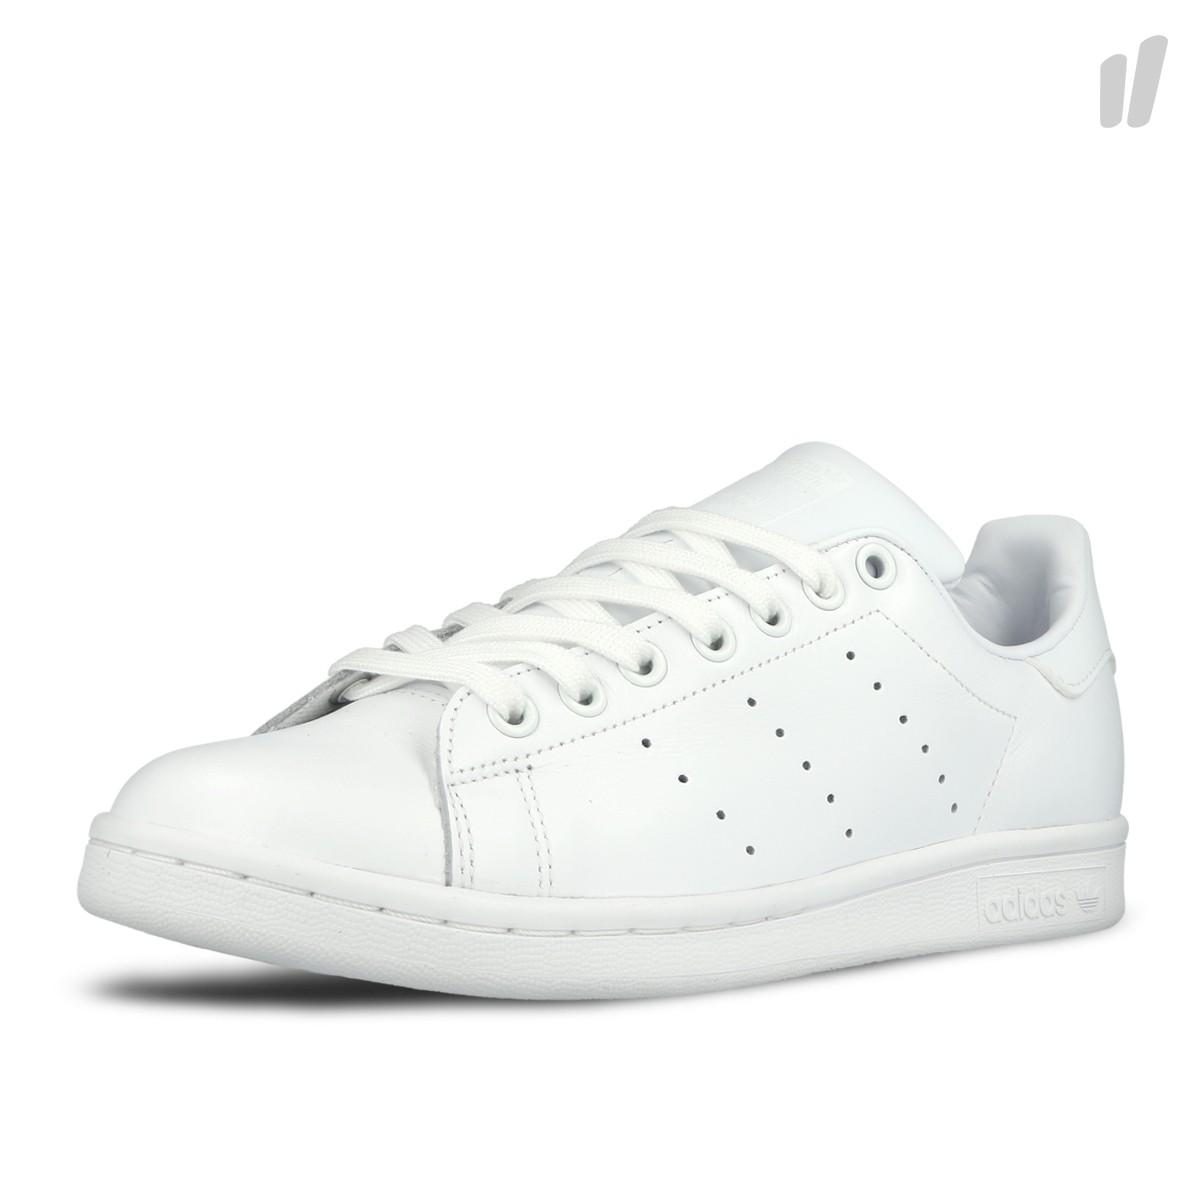 innovative design 752c0 5edb4 The adidas Originals Stan Smith Triple White Is Heavenly ...